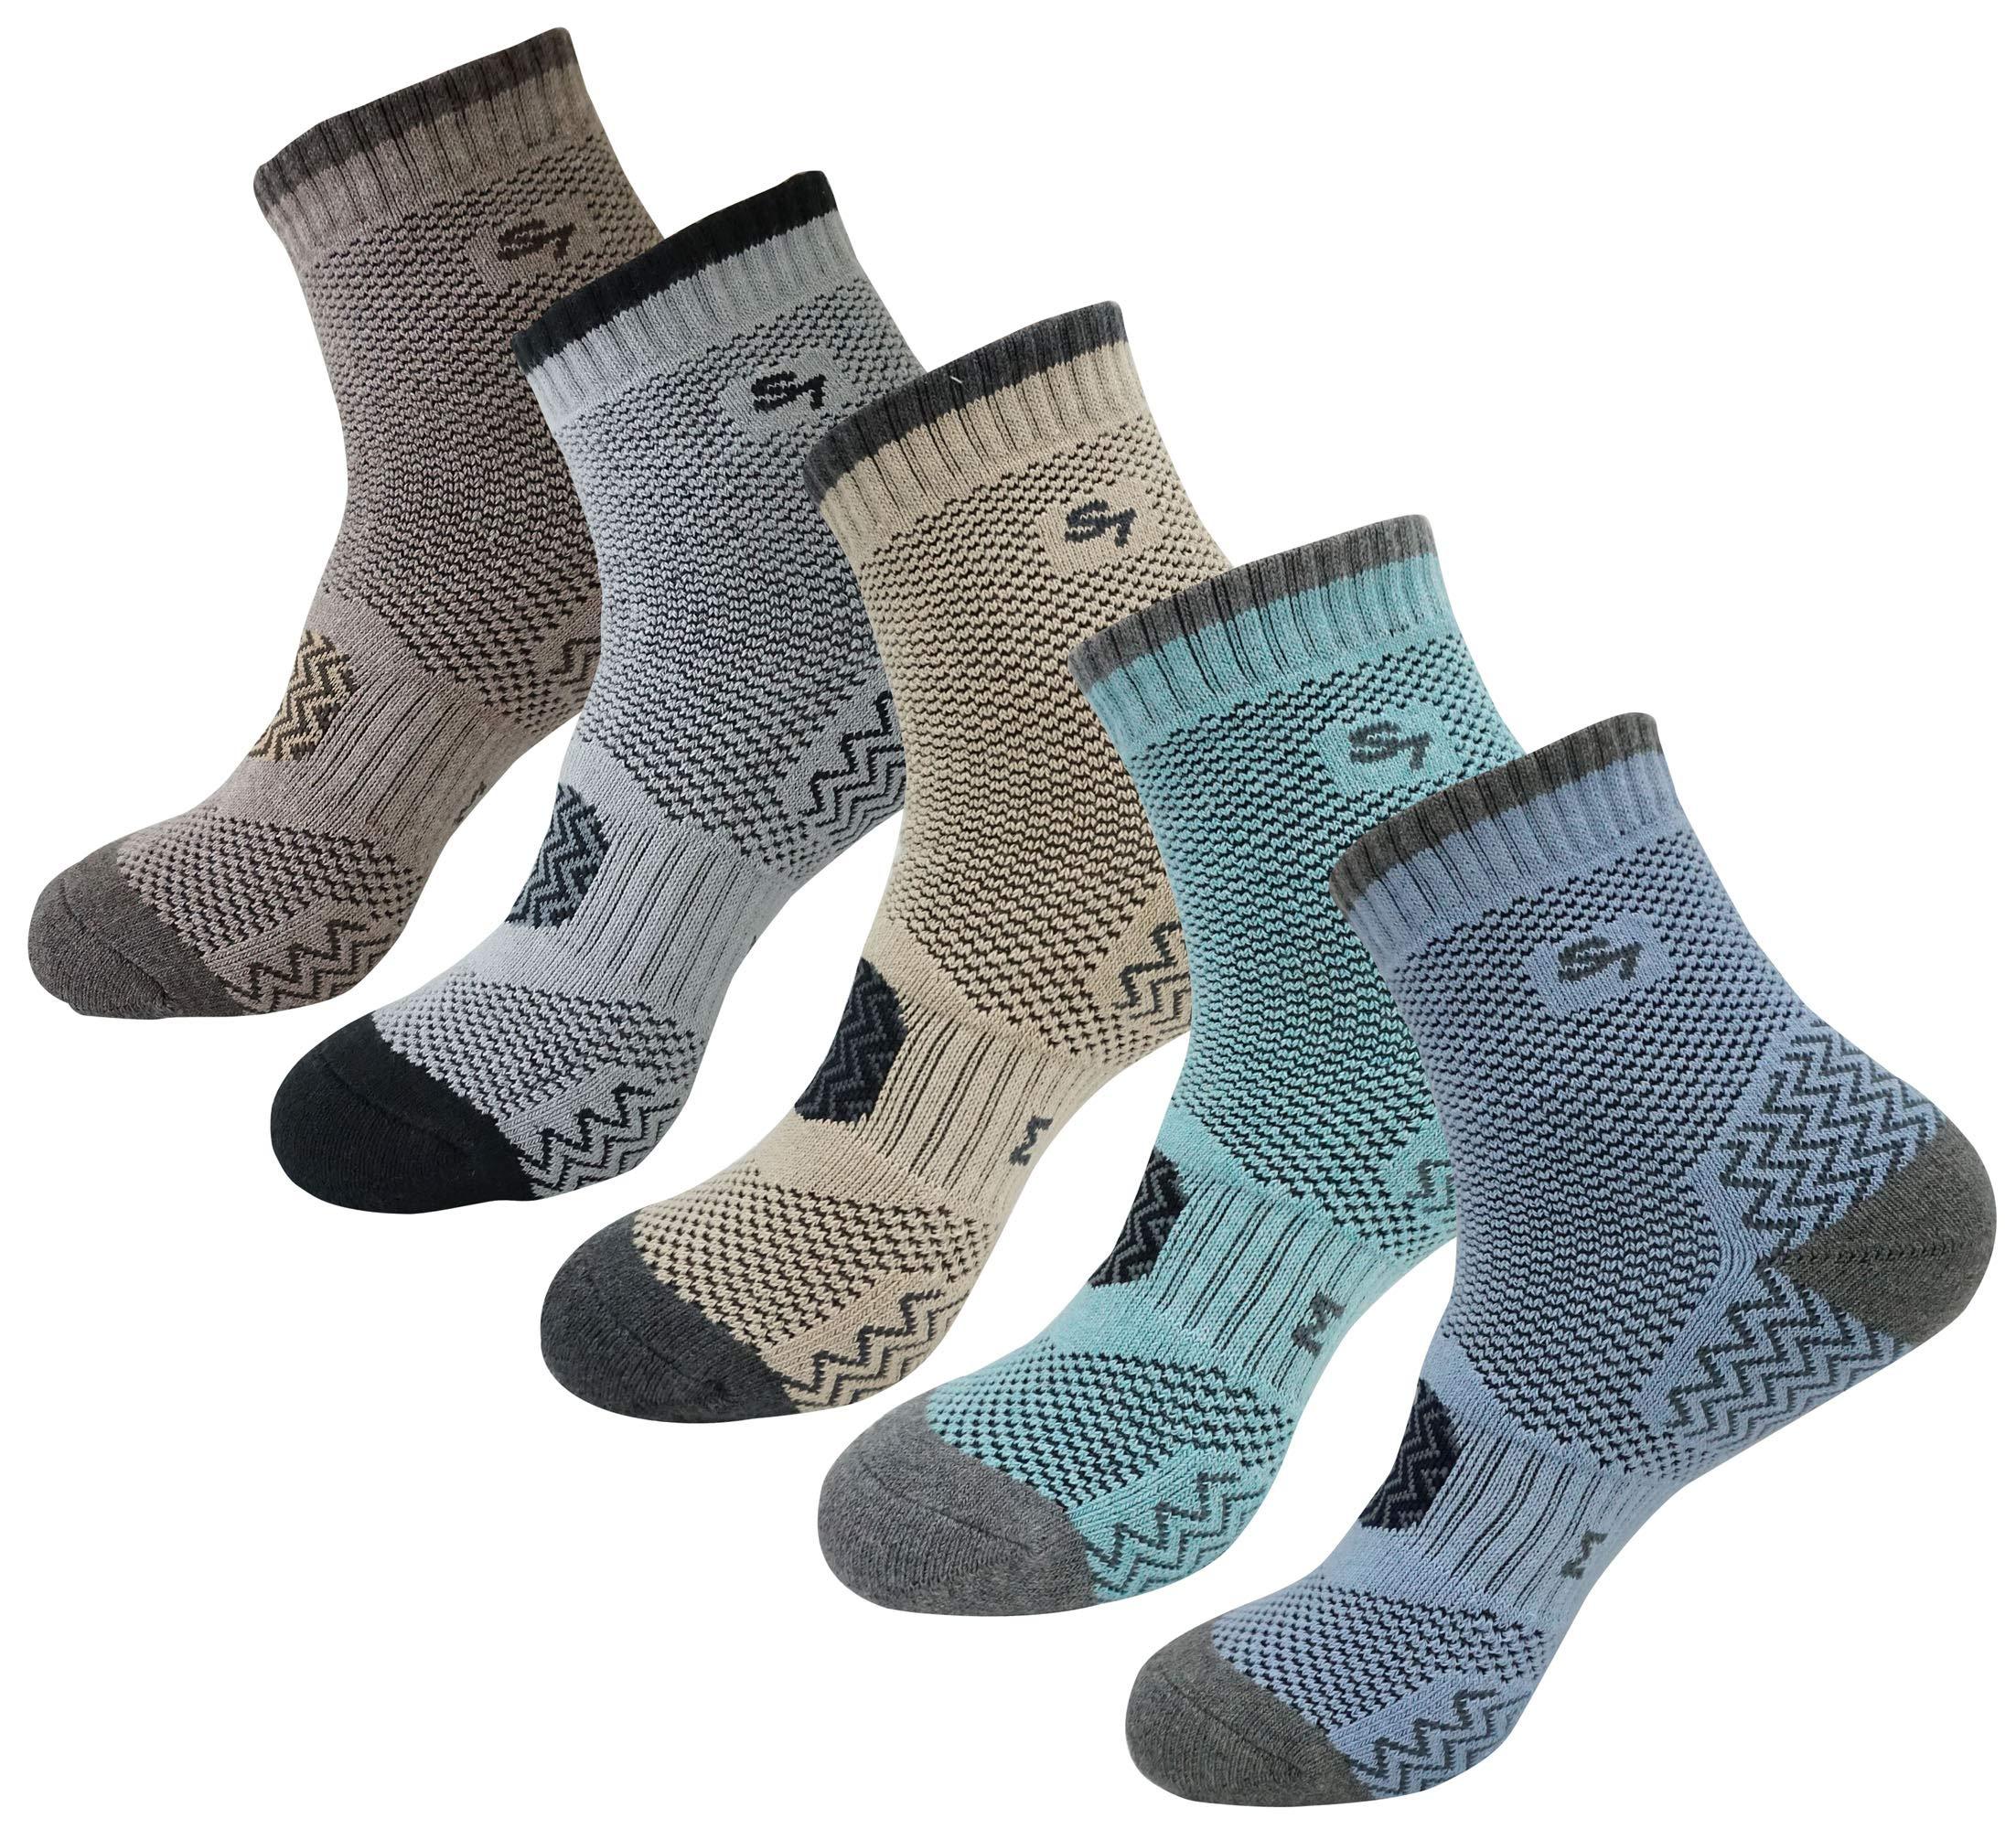 SEOULSTORY7 5pack Men's Full Cushion Mid Quarter Length Hiking Socks 5Pair Brown/Gray/Mint/Light Blue/Beige XL3 by SEOULSTORY7